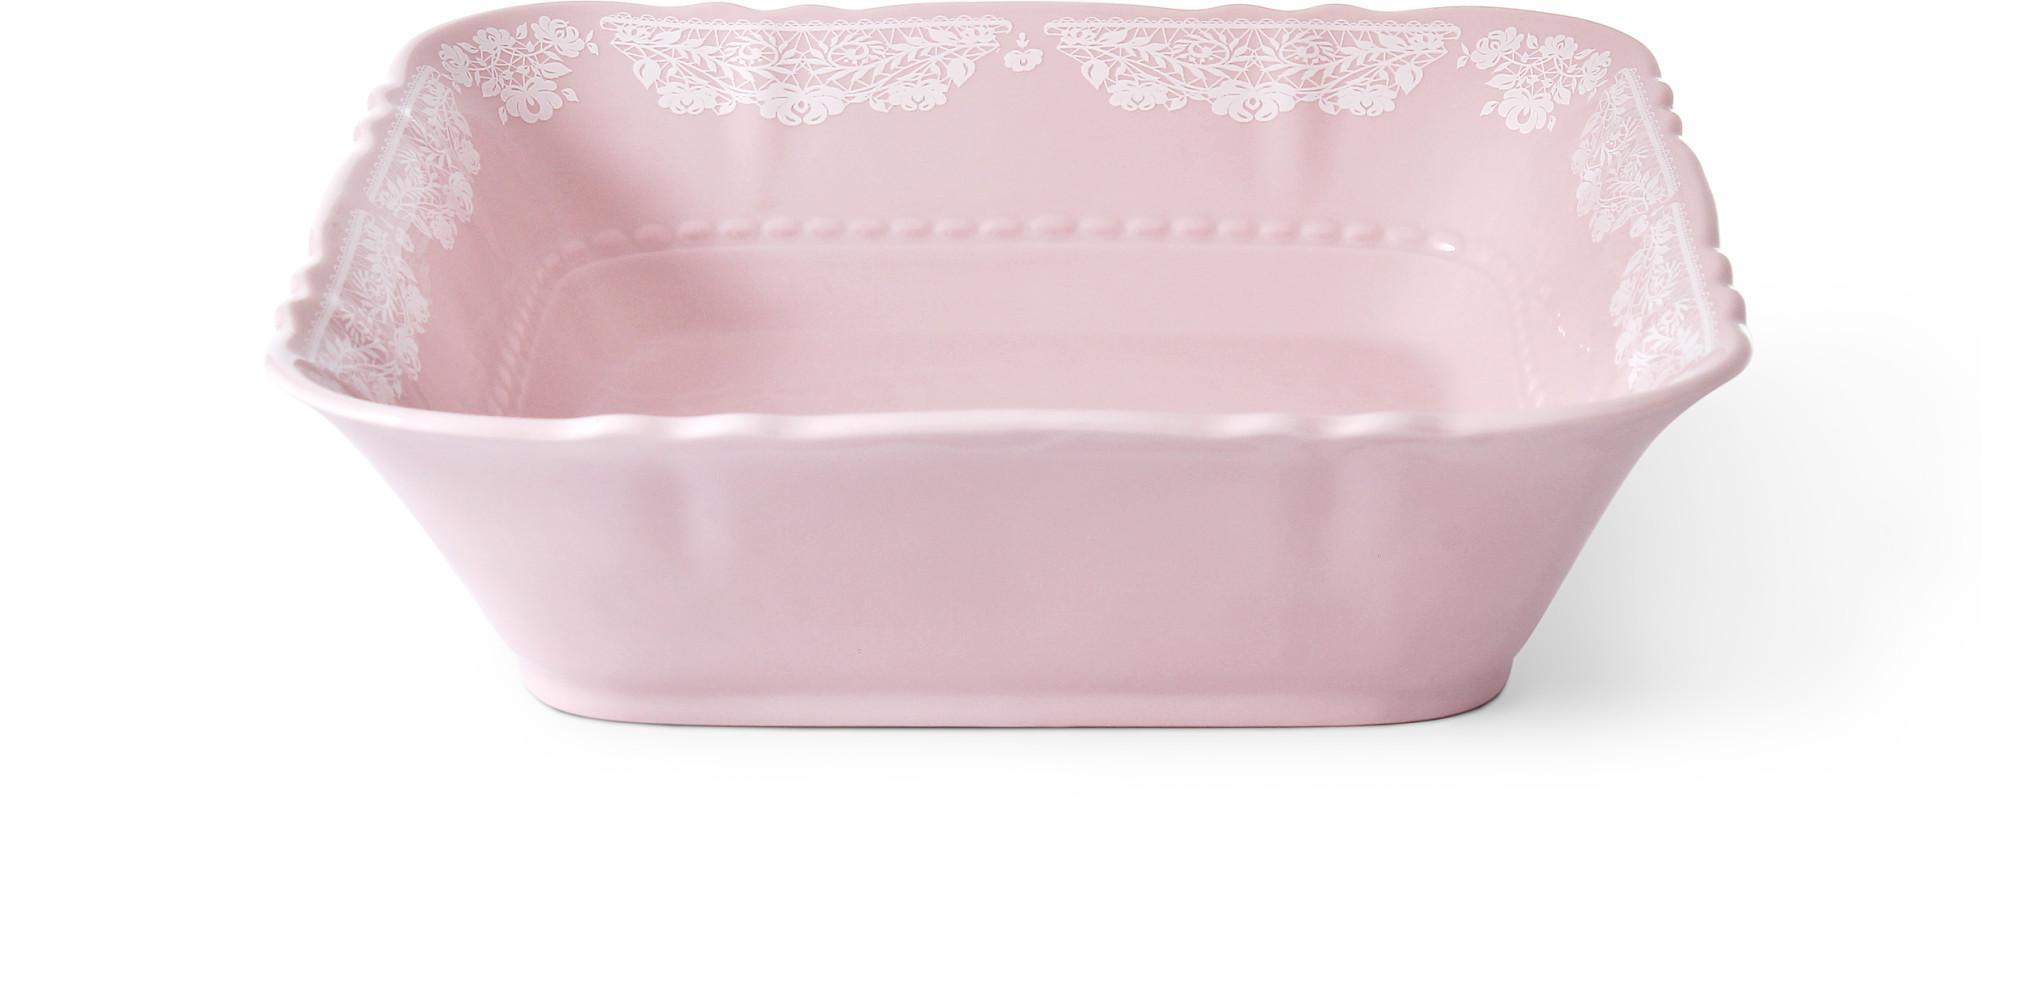 Miska čtyřhranná 21 cm Krajka růžový porcelán